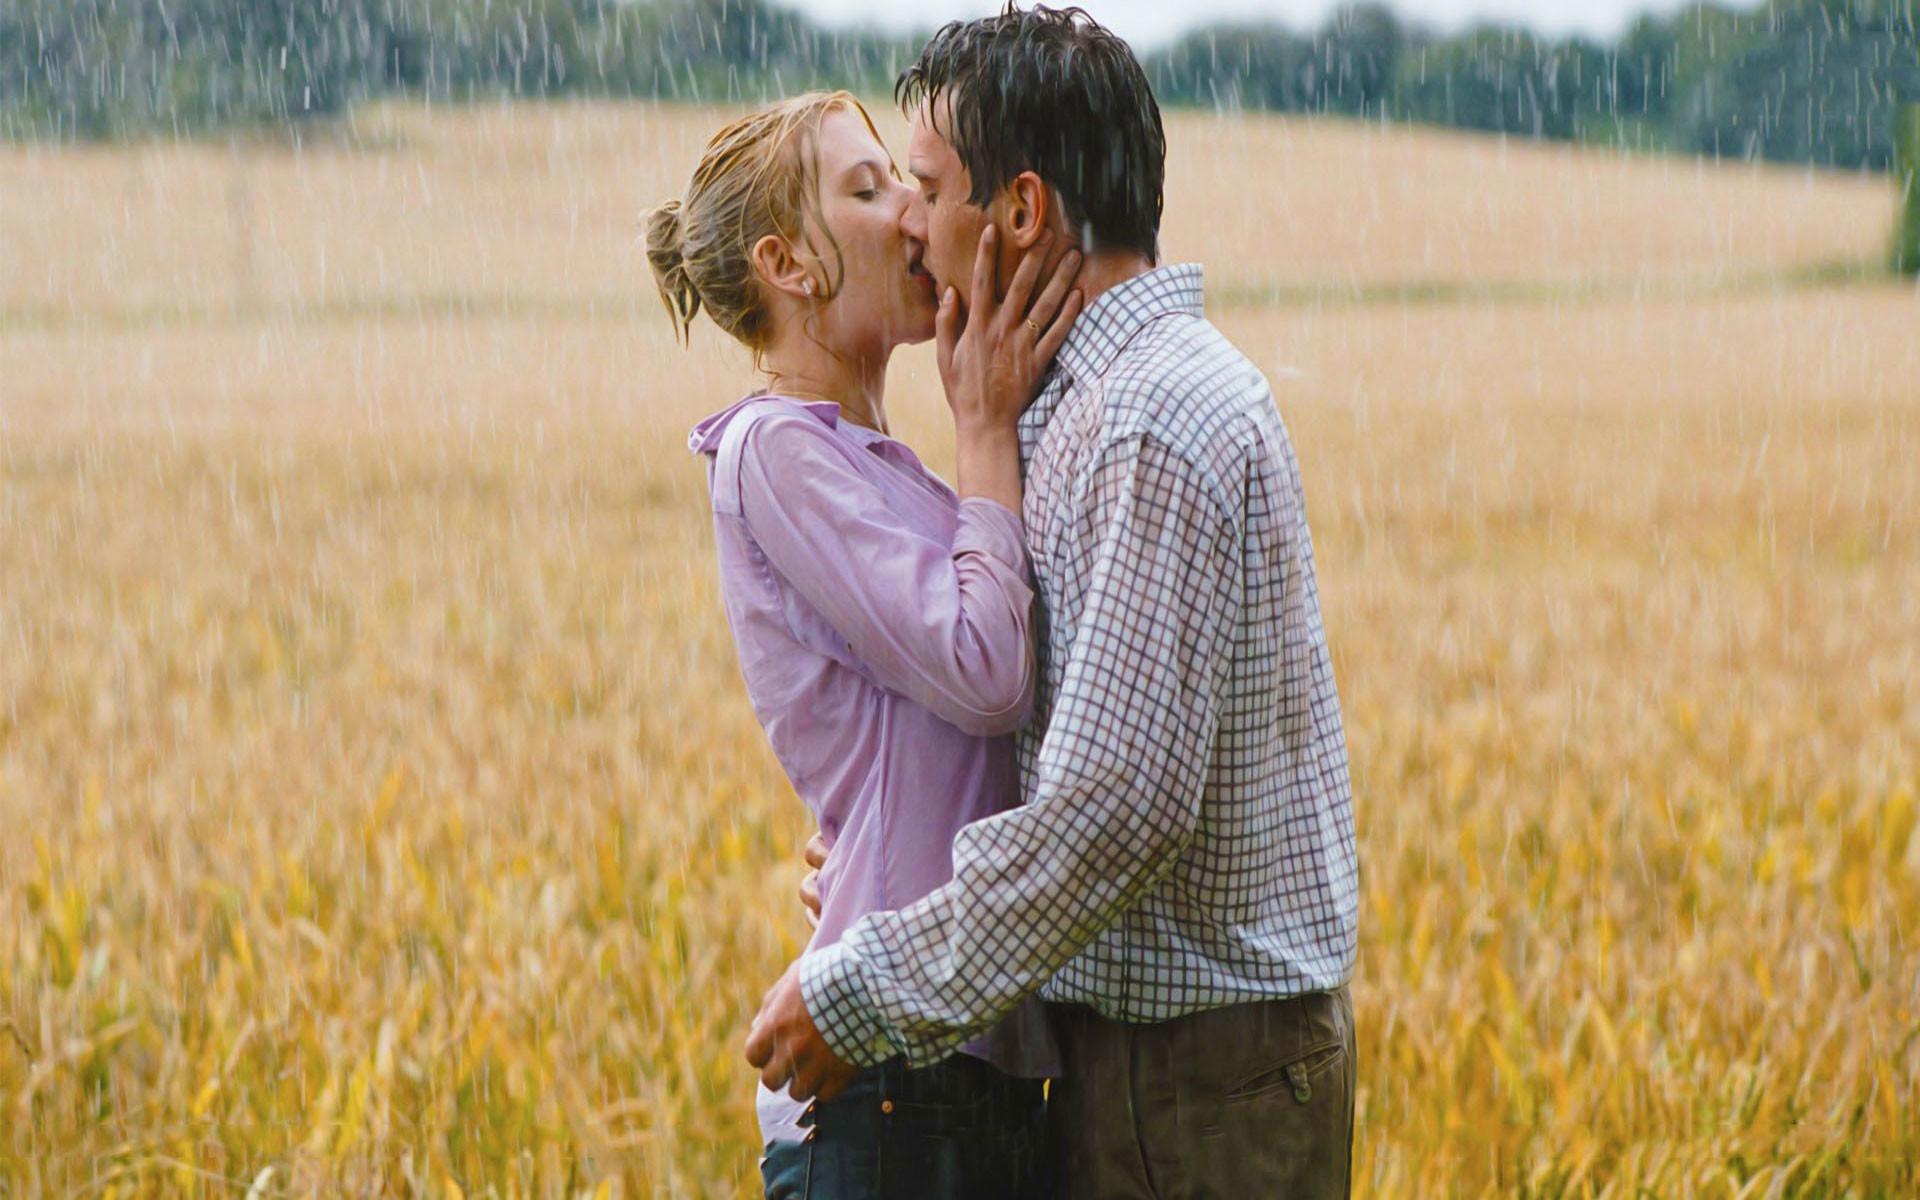 Rainy Day Couple Wallpaper